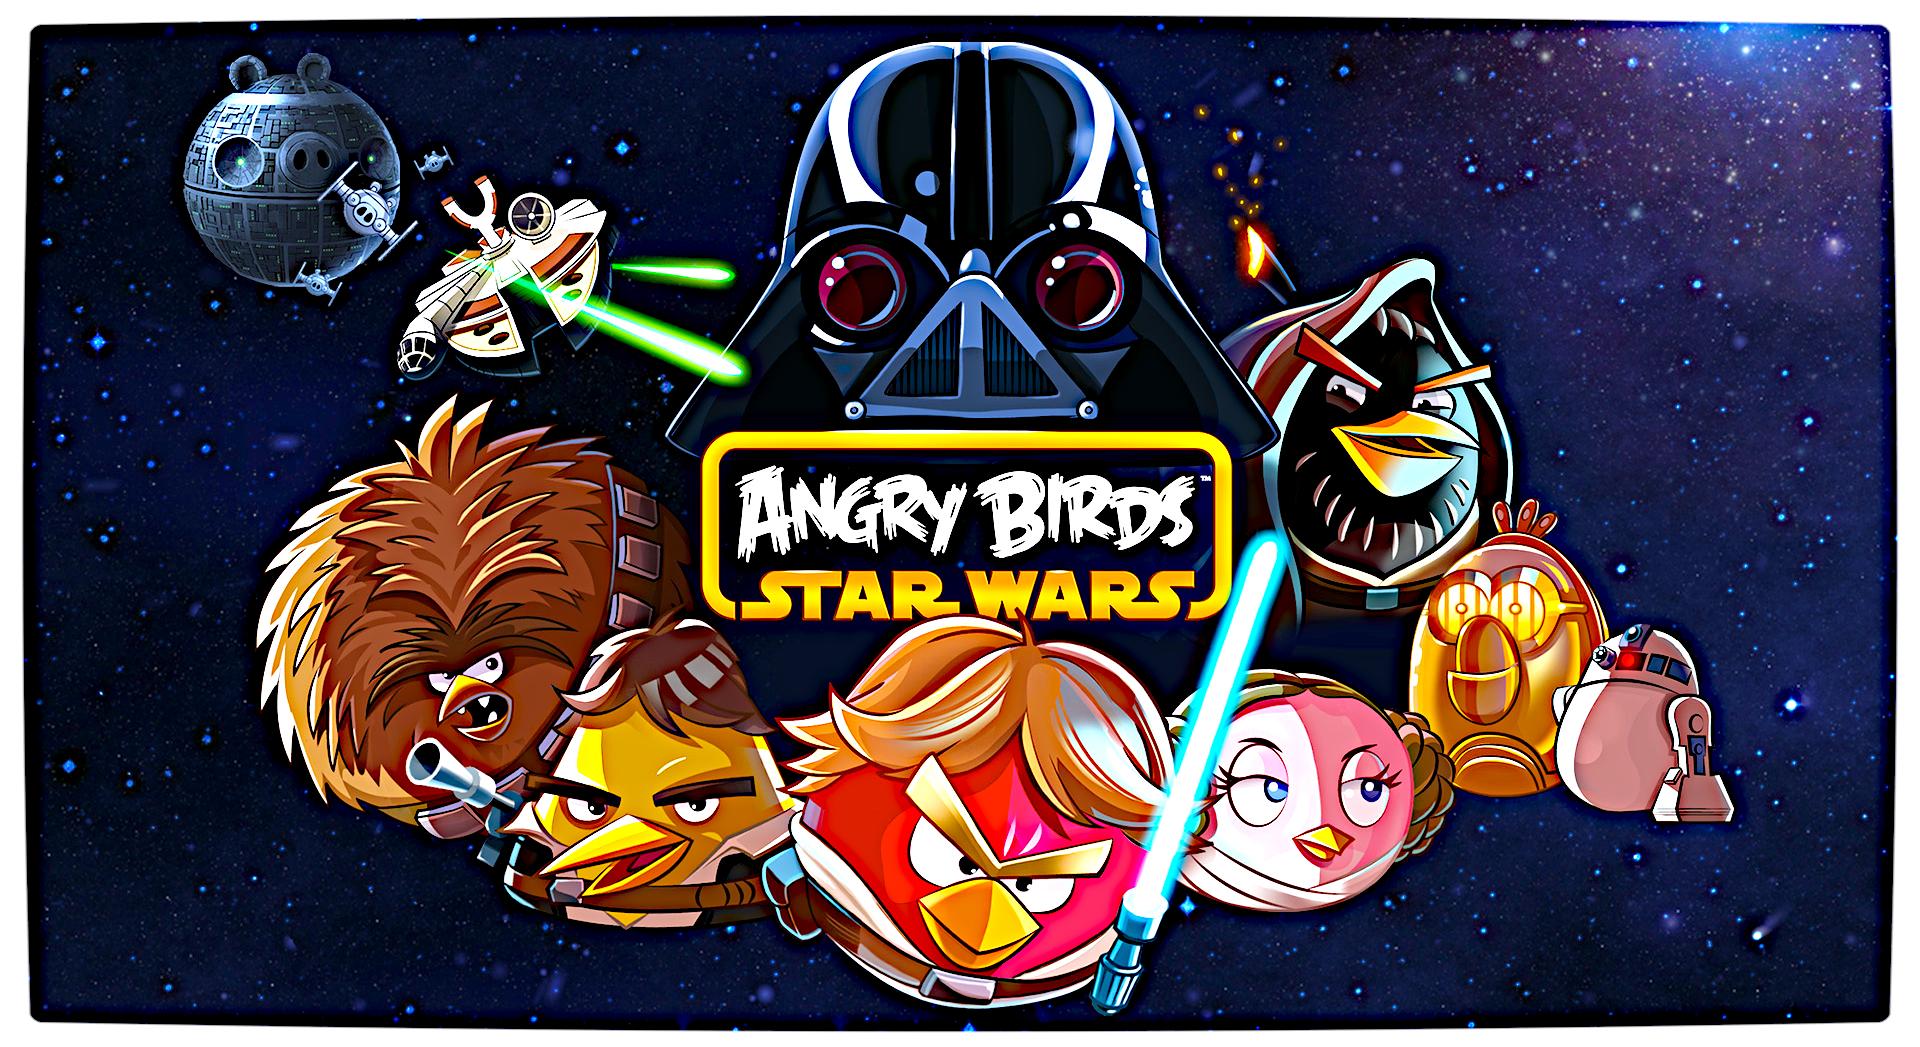 Vamers-Rovio-Angry-Birds-Star-Wars-Poster